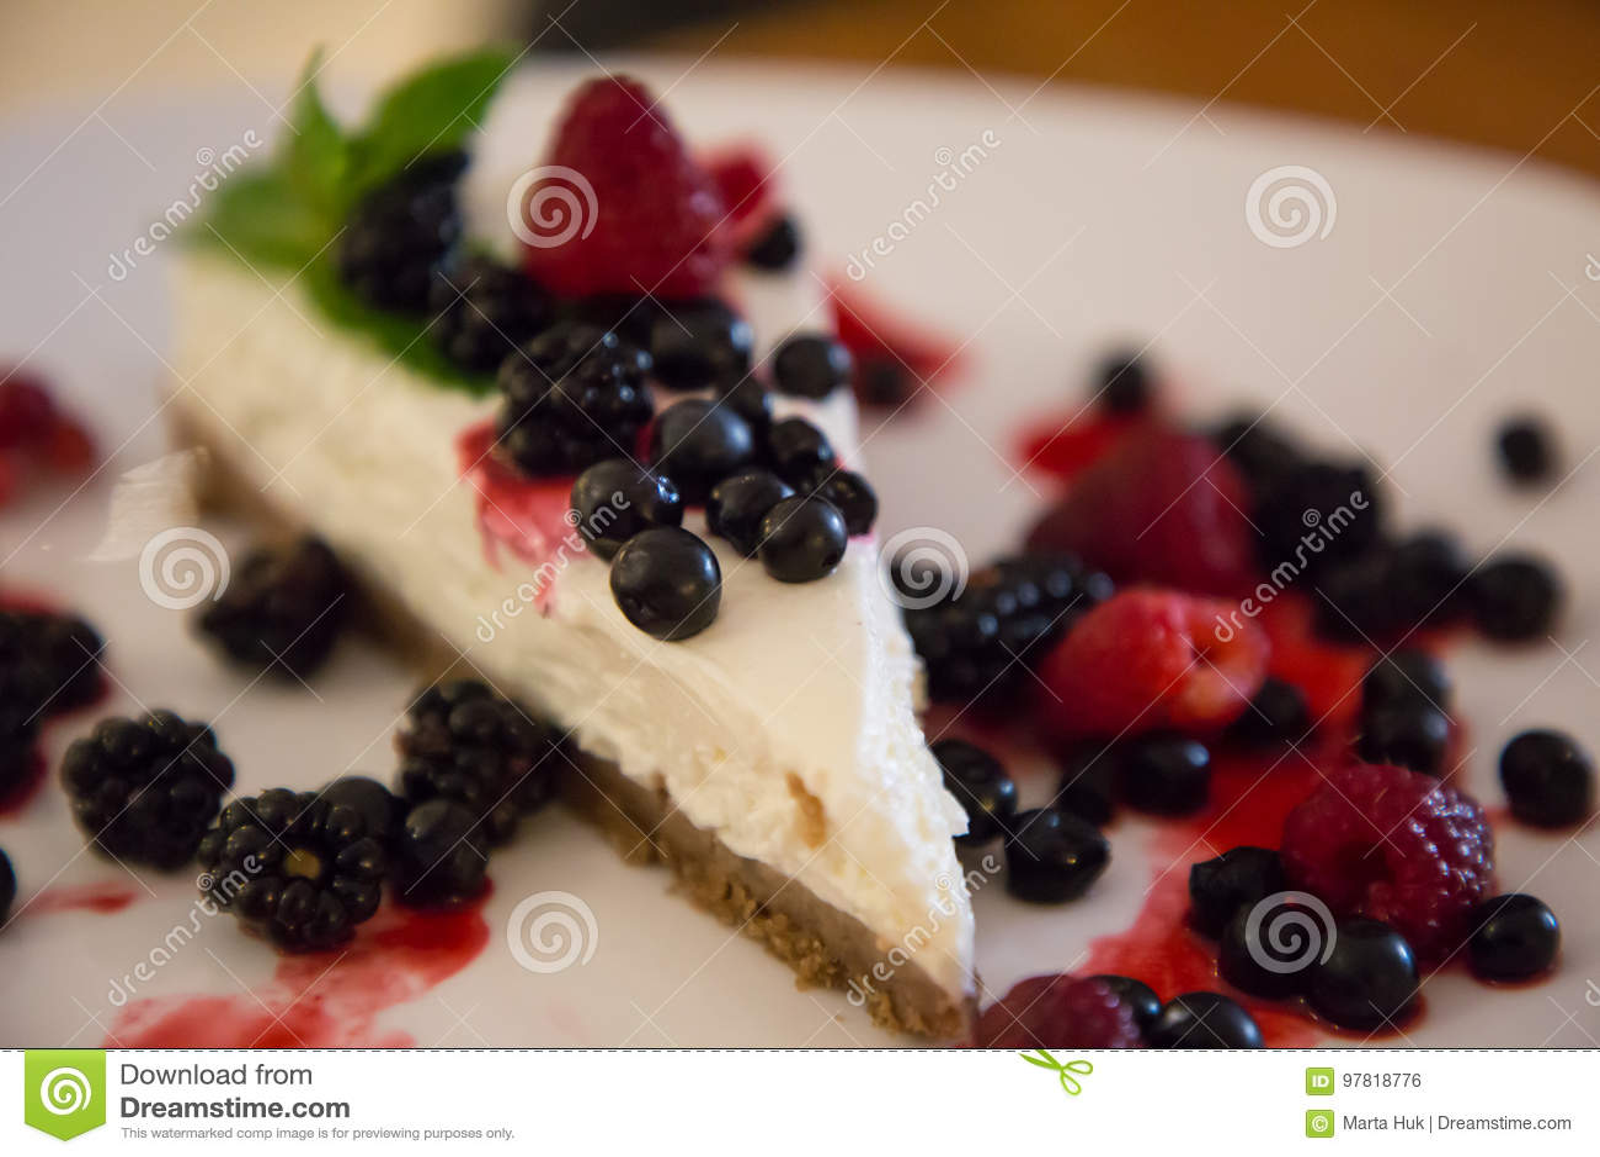 Jagodowy cheesecake z jagodami na talerzu